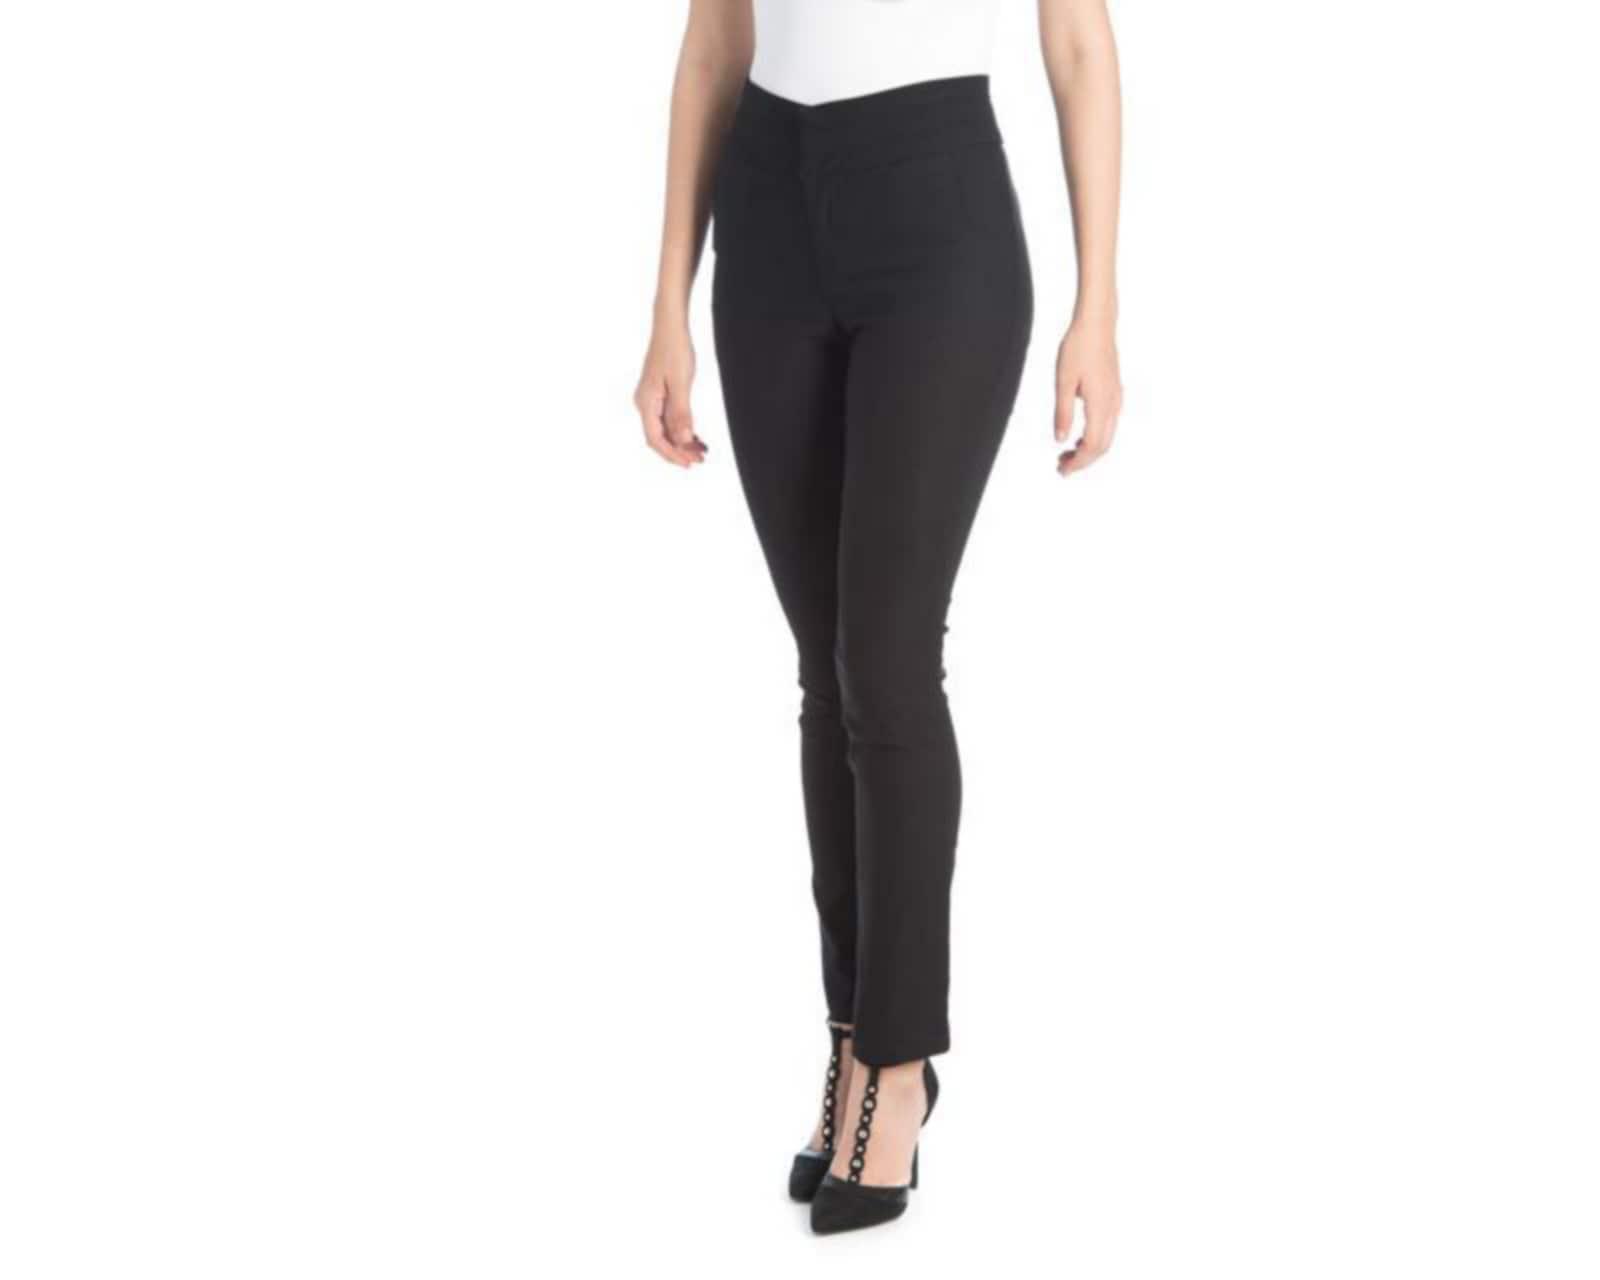 Pantalon De Vestir Negro Marca Sahara Para Mujer 3216842 Coppel